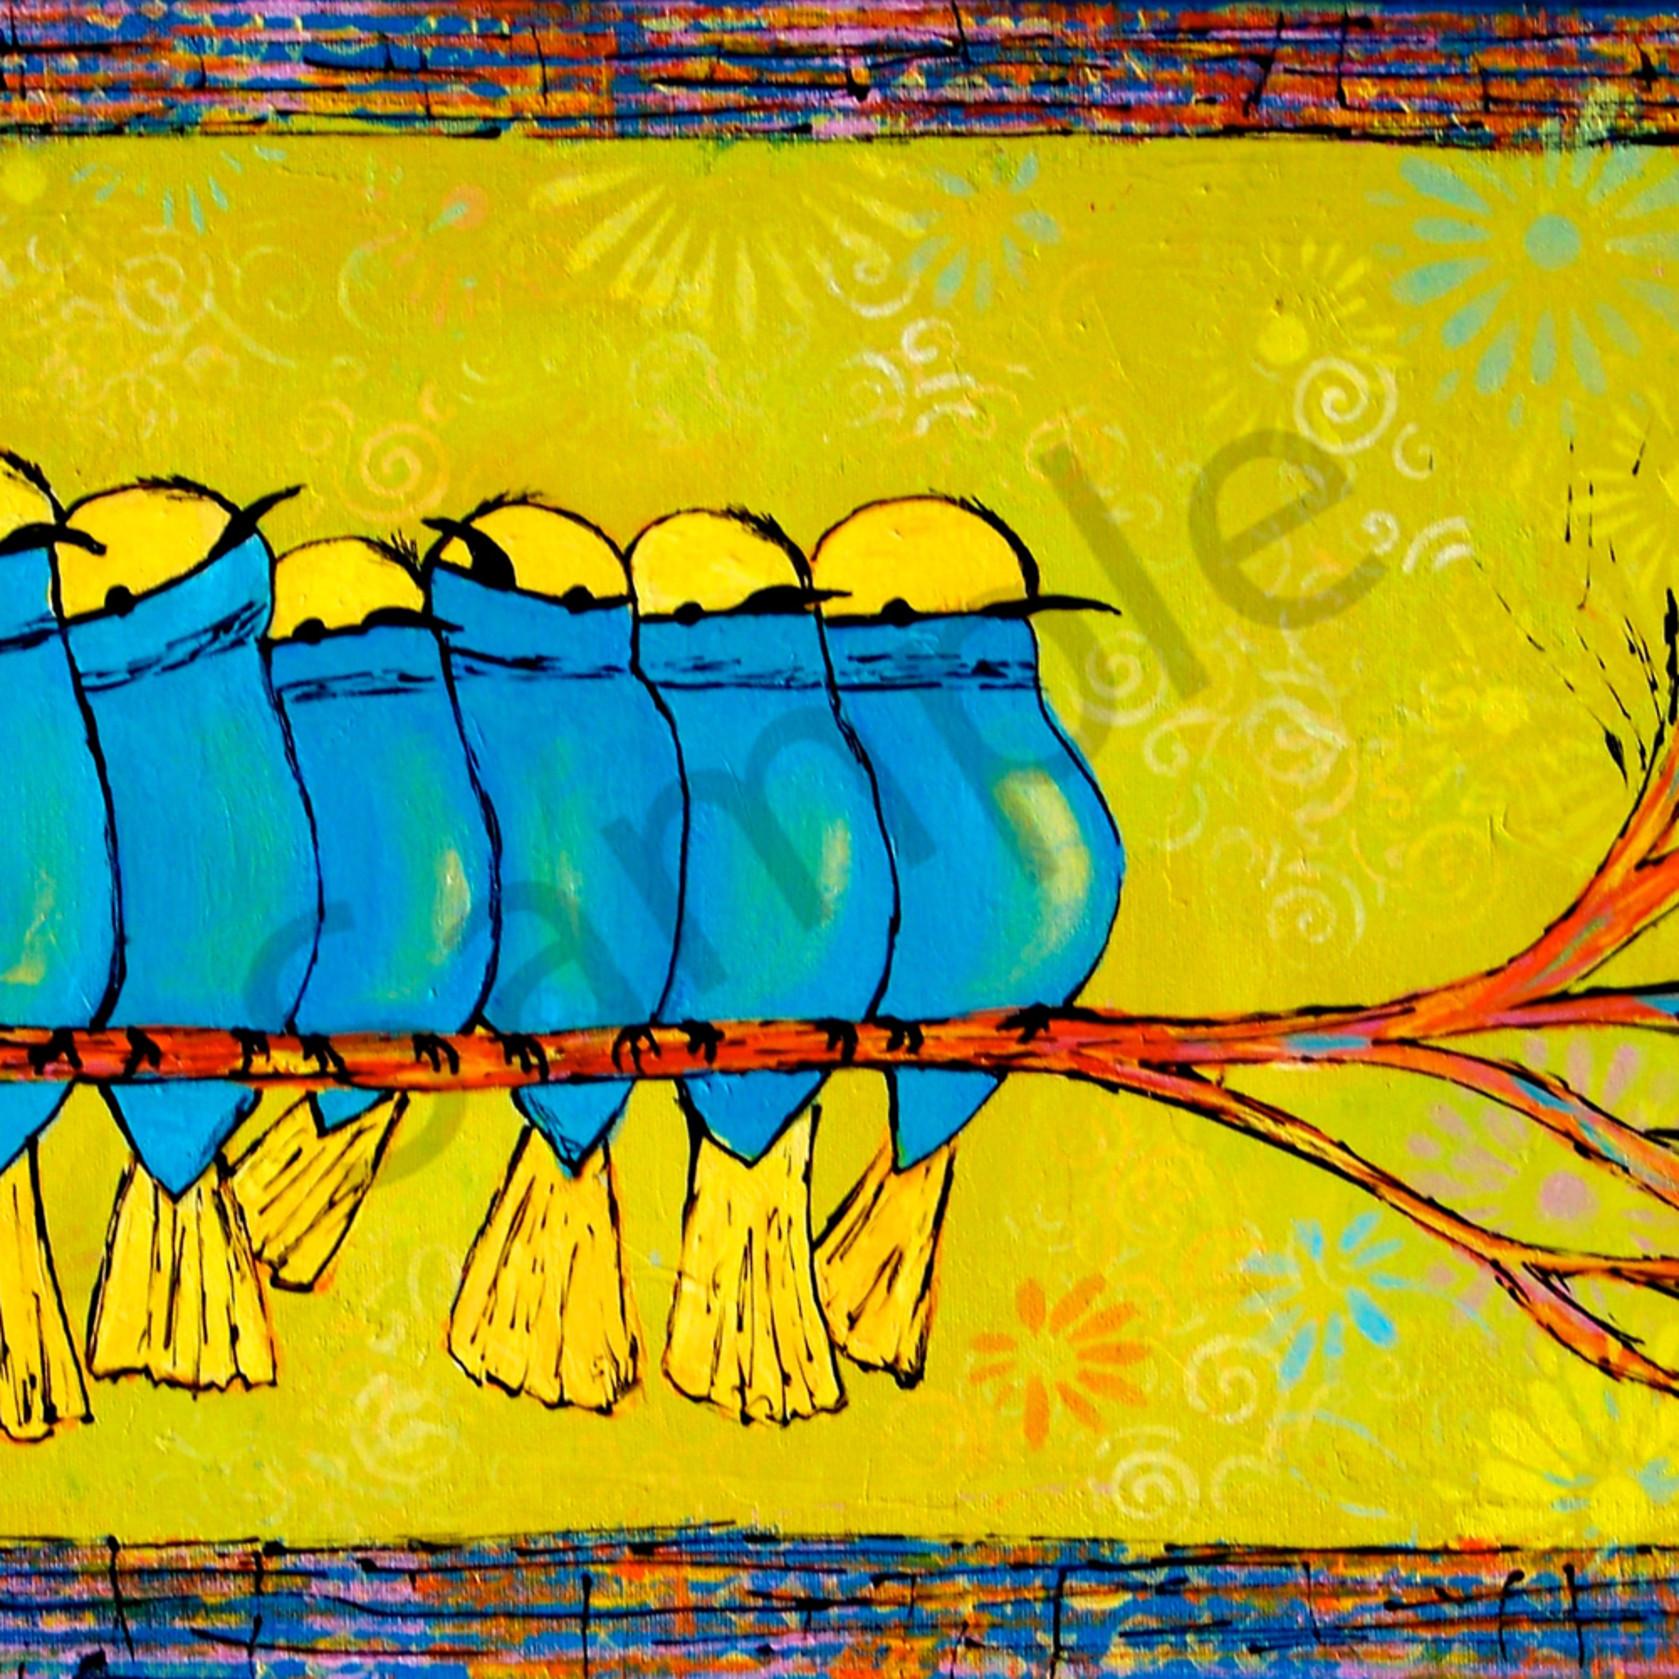 Sevenchubb blues nwcou1